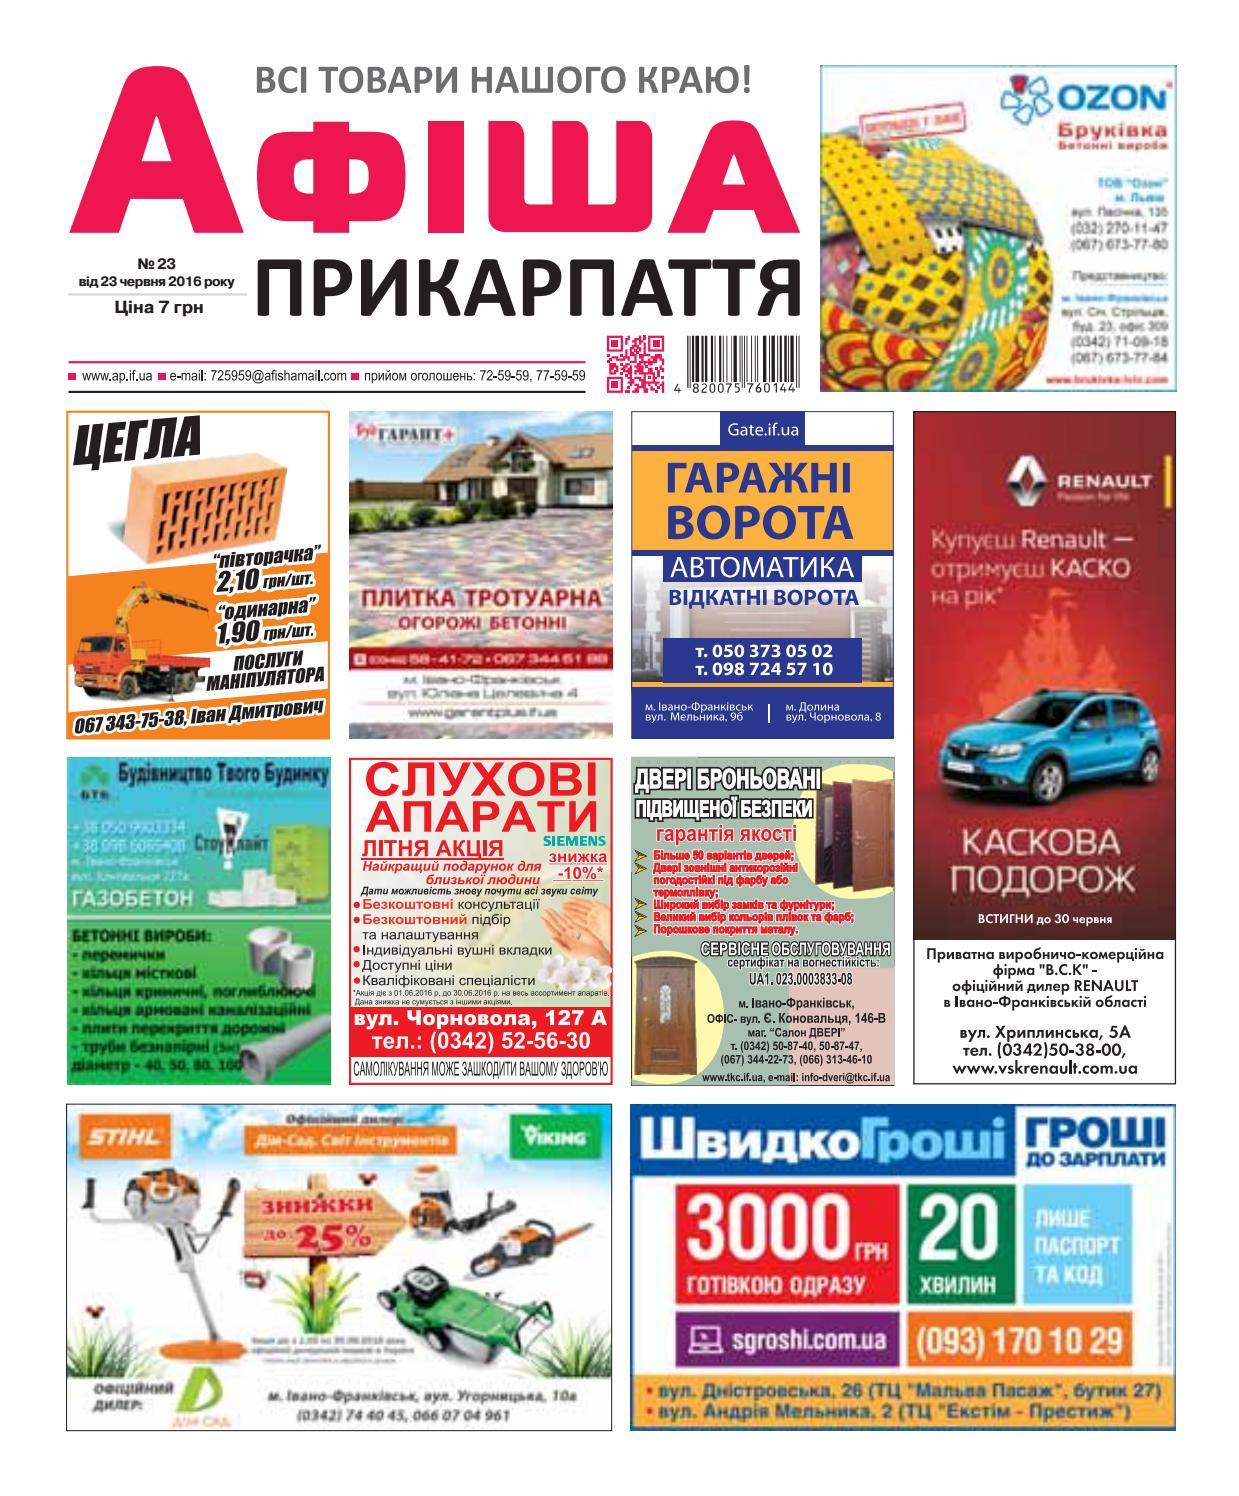 Афіша ПРИКАРПАТТЯ №23 by Olya Olya - issuu 5fe945720819d